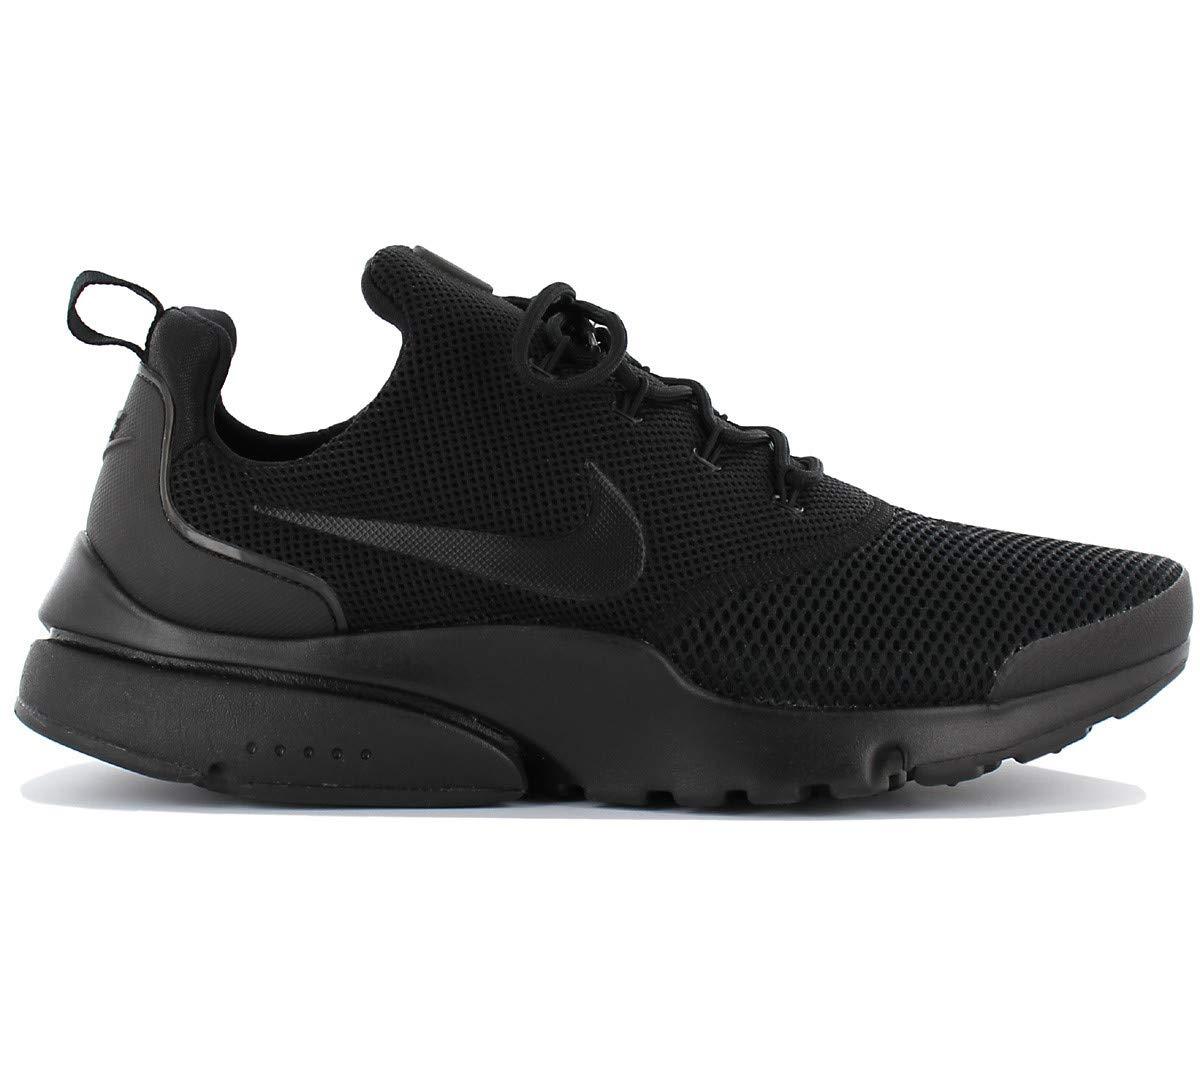 949c9c76199 Galleon - Nike Men Presto Fly Running Sneaker Shoes